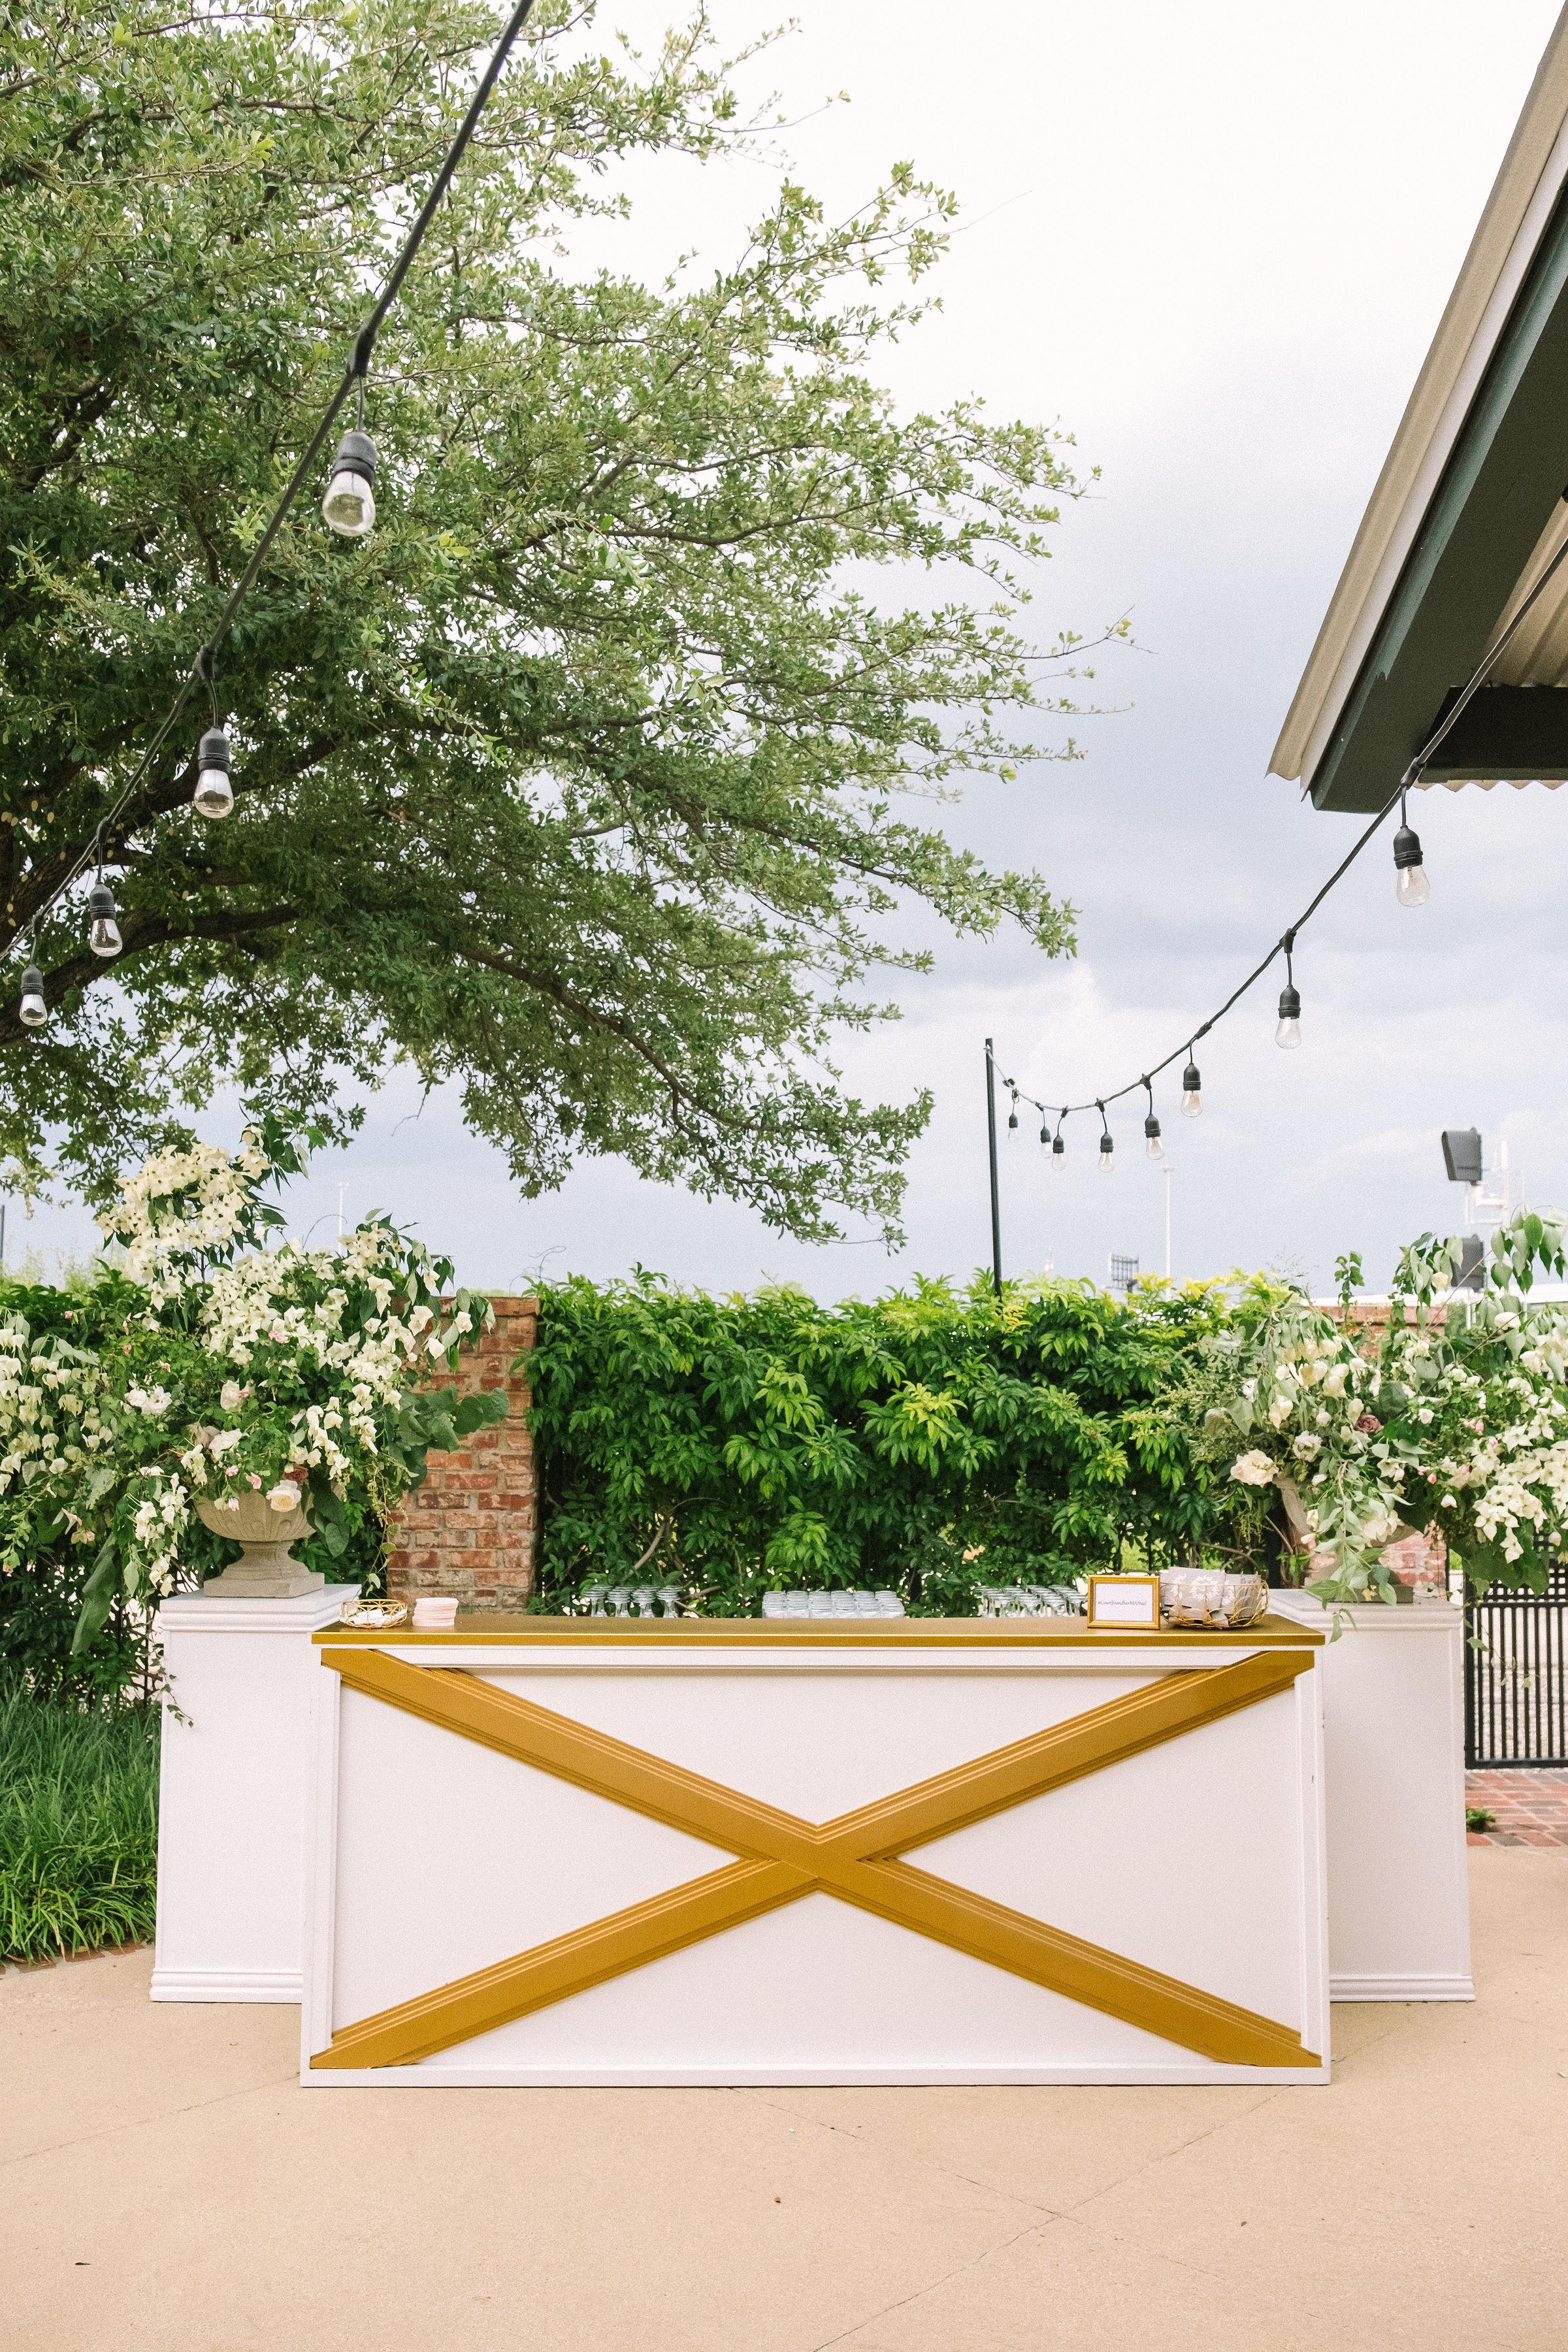 Ellen-Ashton-Photography-Girt-and-gold-events-weddings-Ashton-Depot-Weddings676.jpg